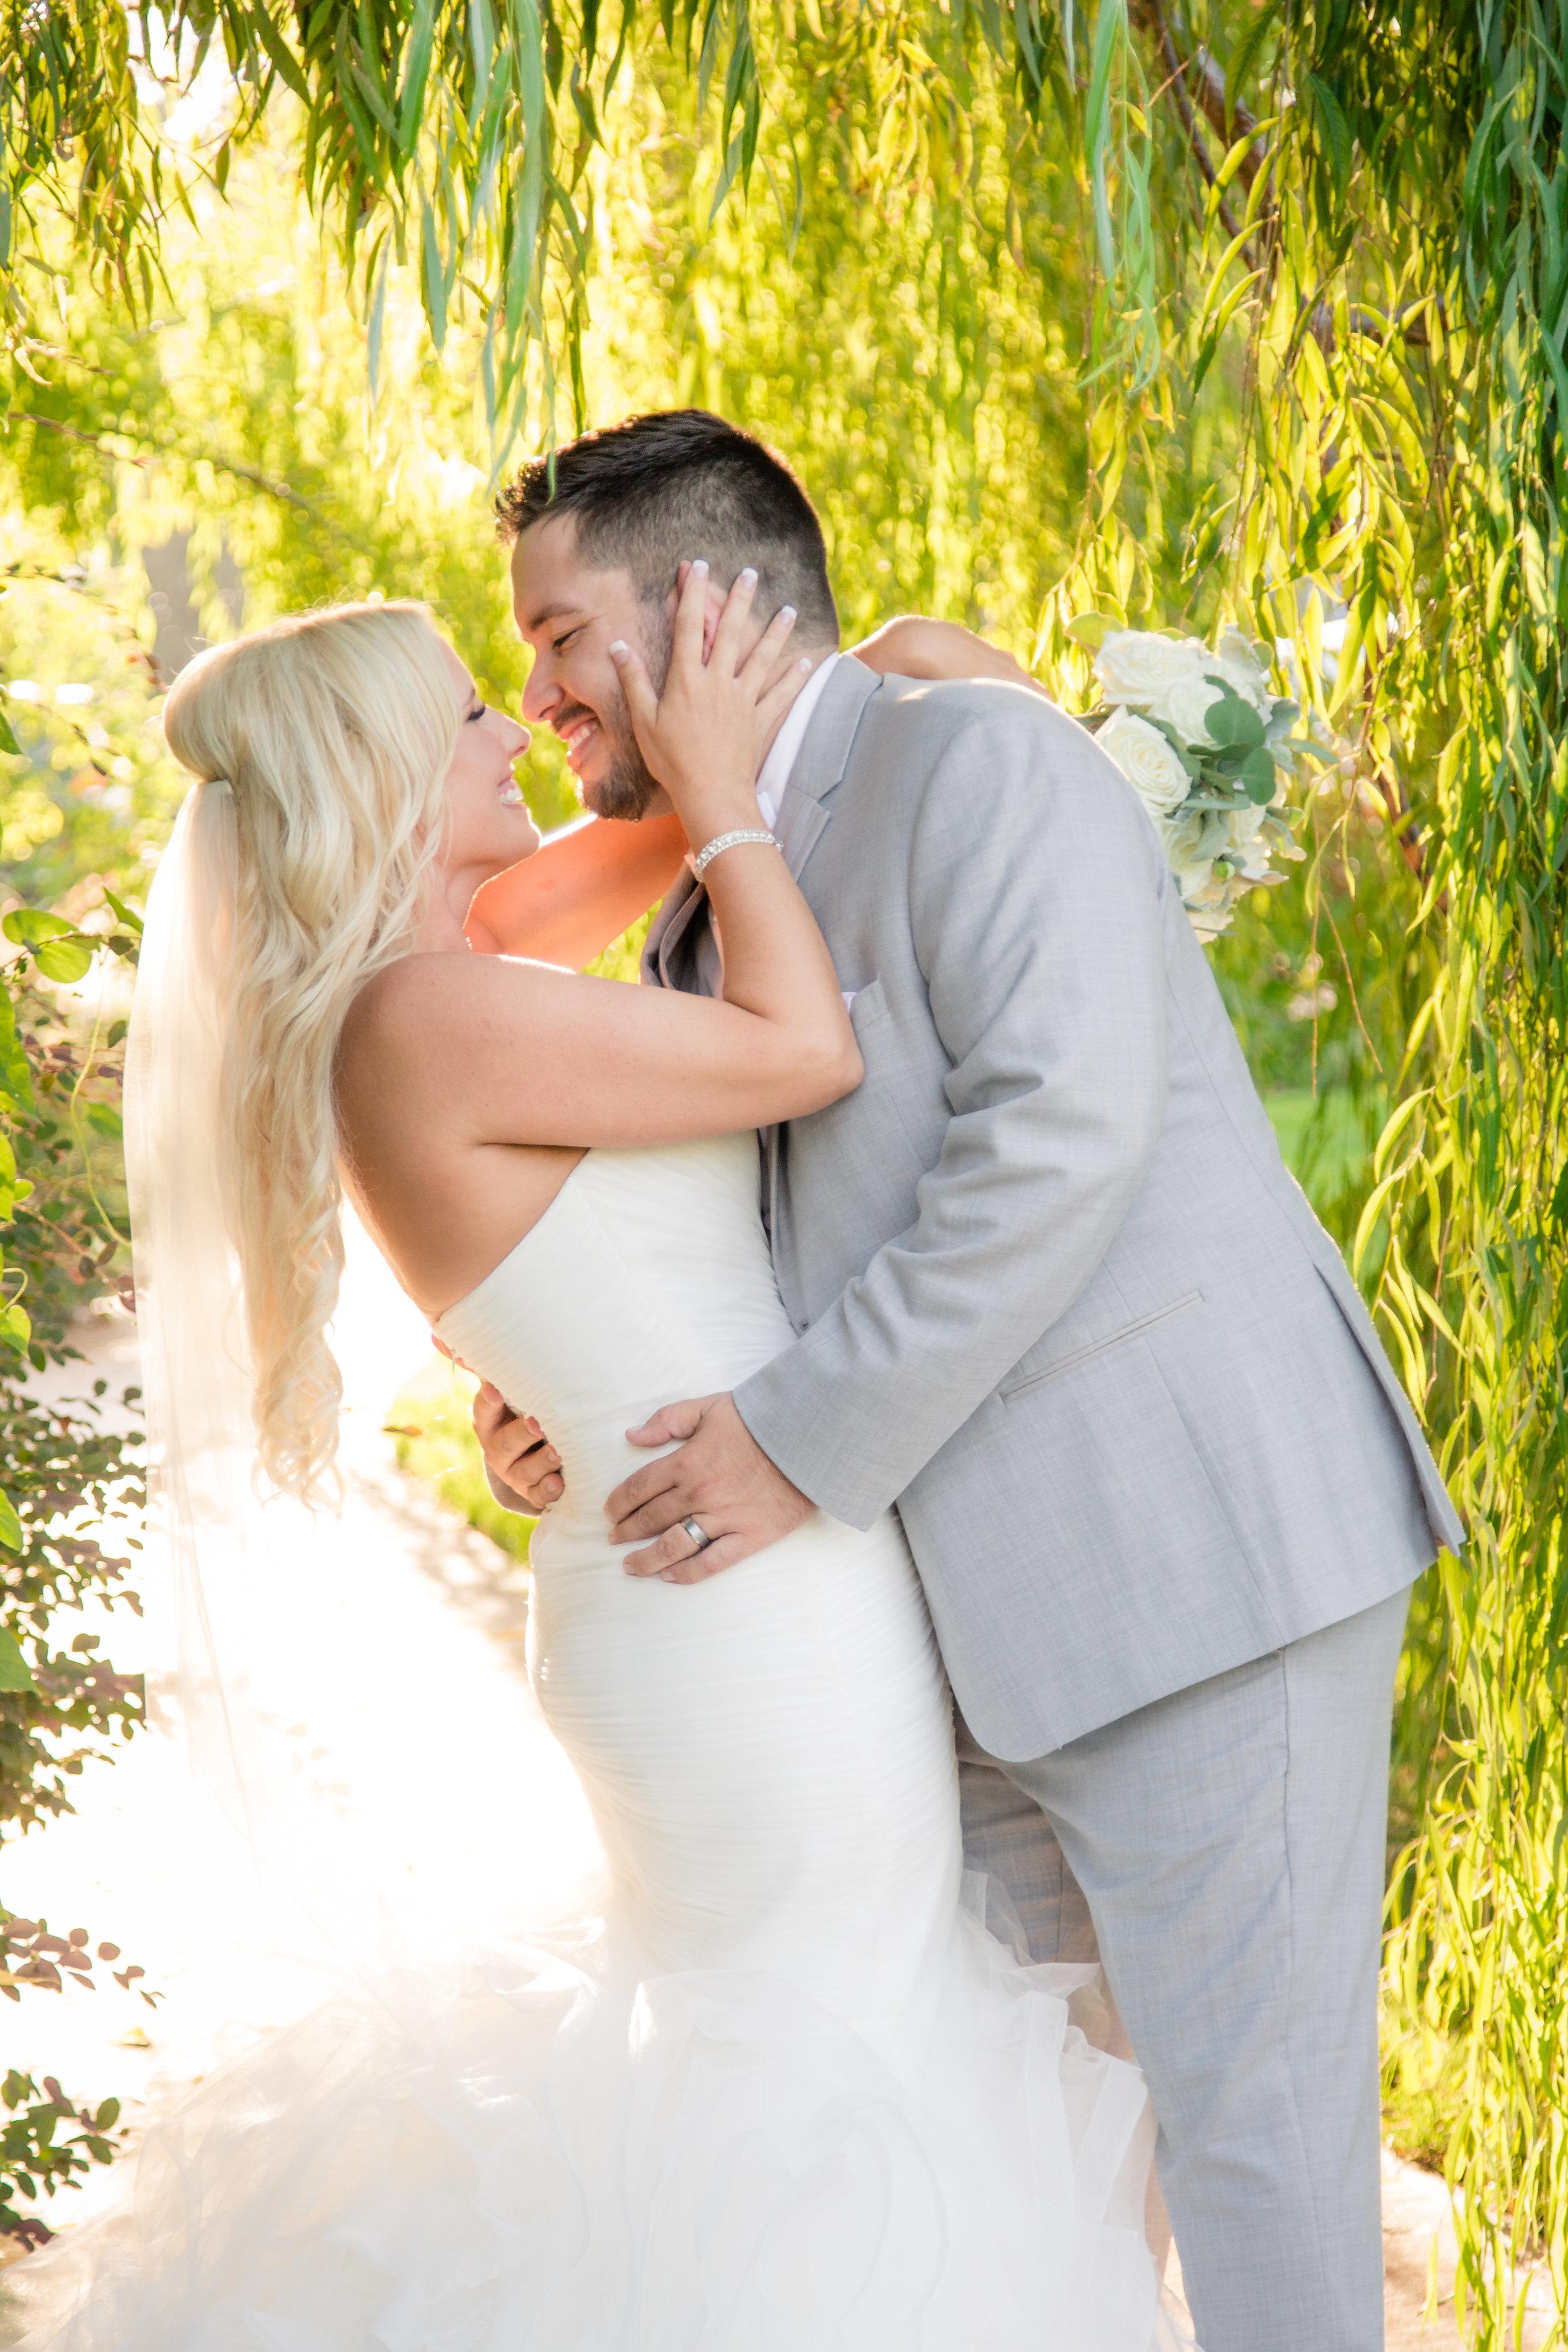 White Ranch Events - Chico - Ashley Teasley Photography - Sacramento Wedding Photographer24.JPG